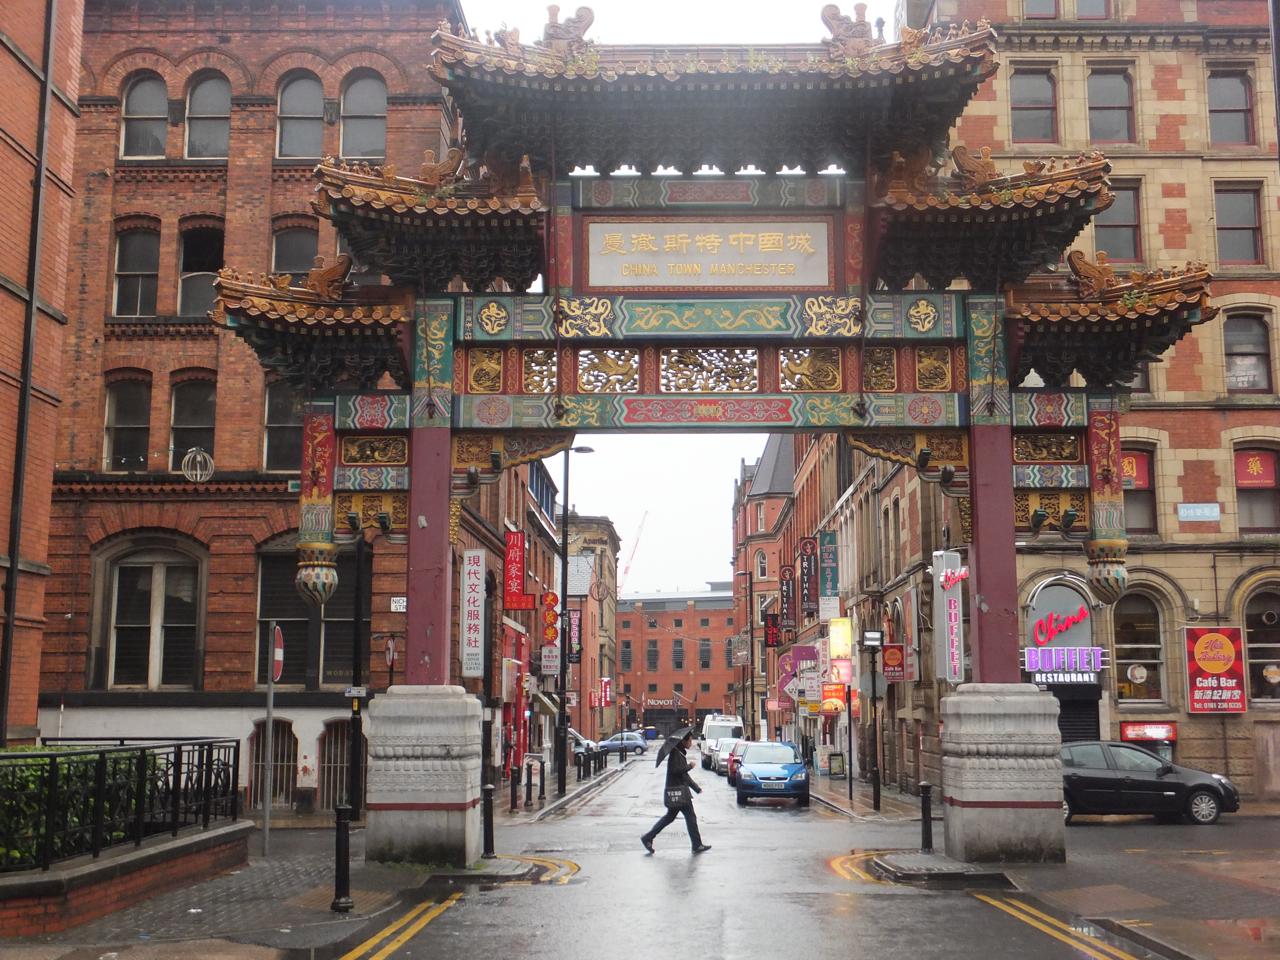 Chinatown arch, 21/10/13